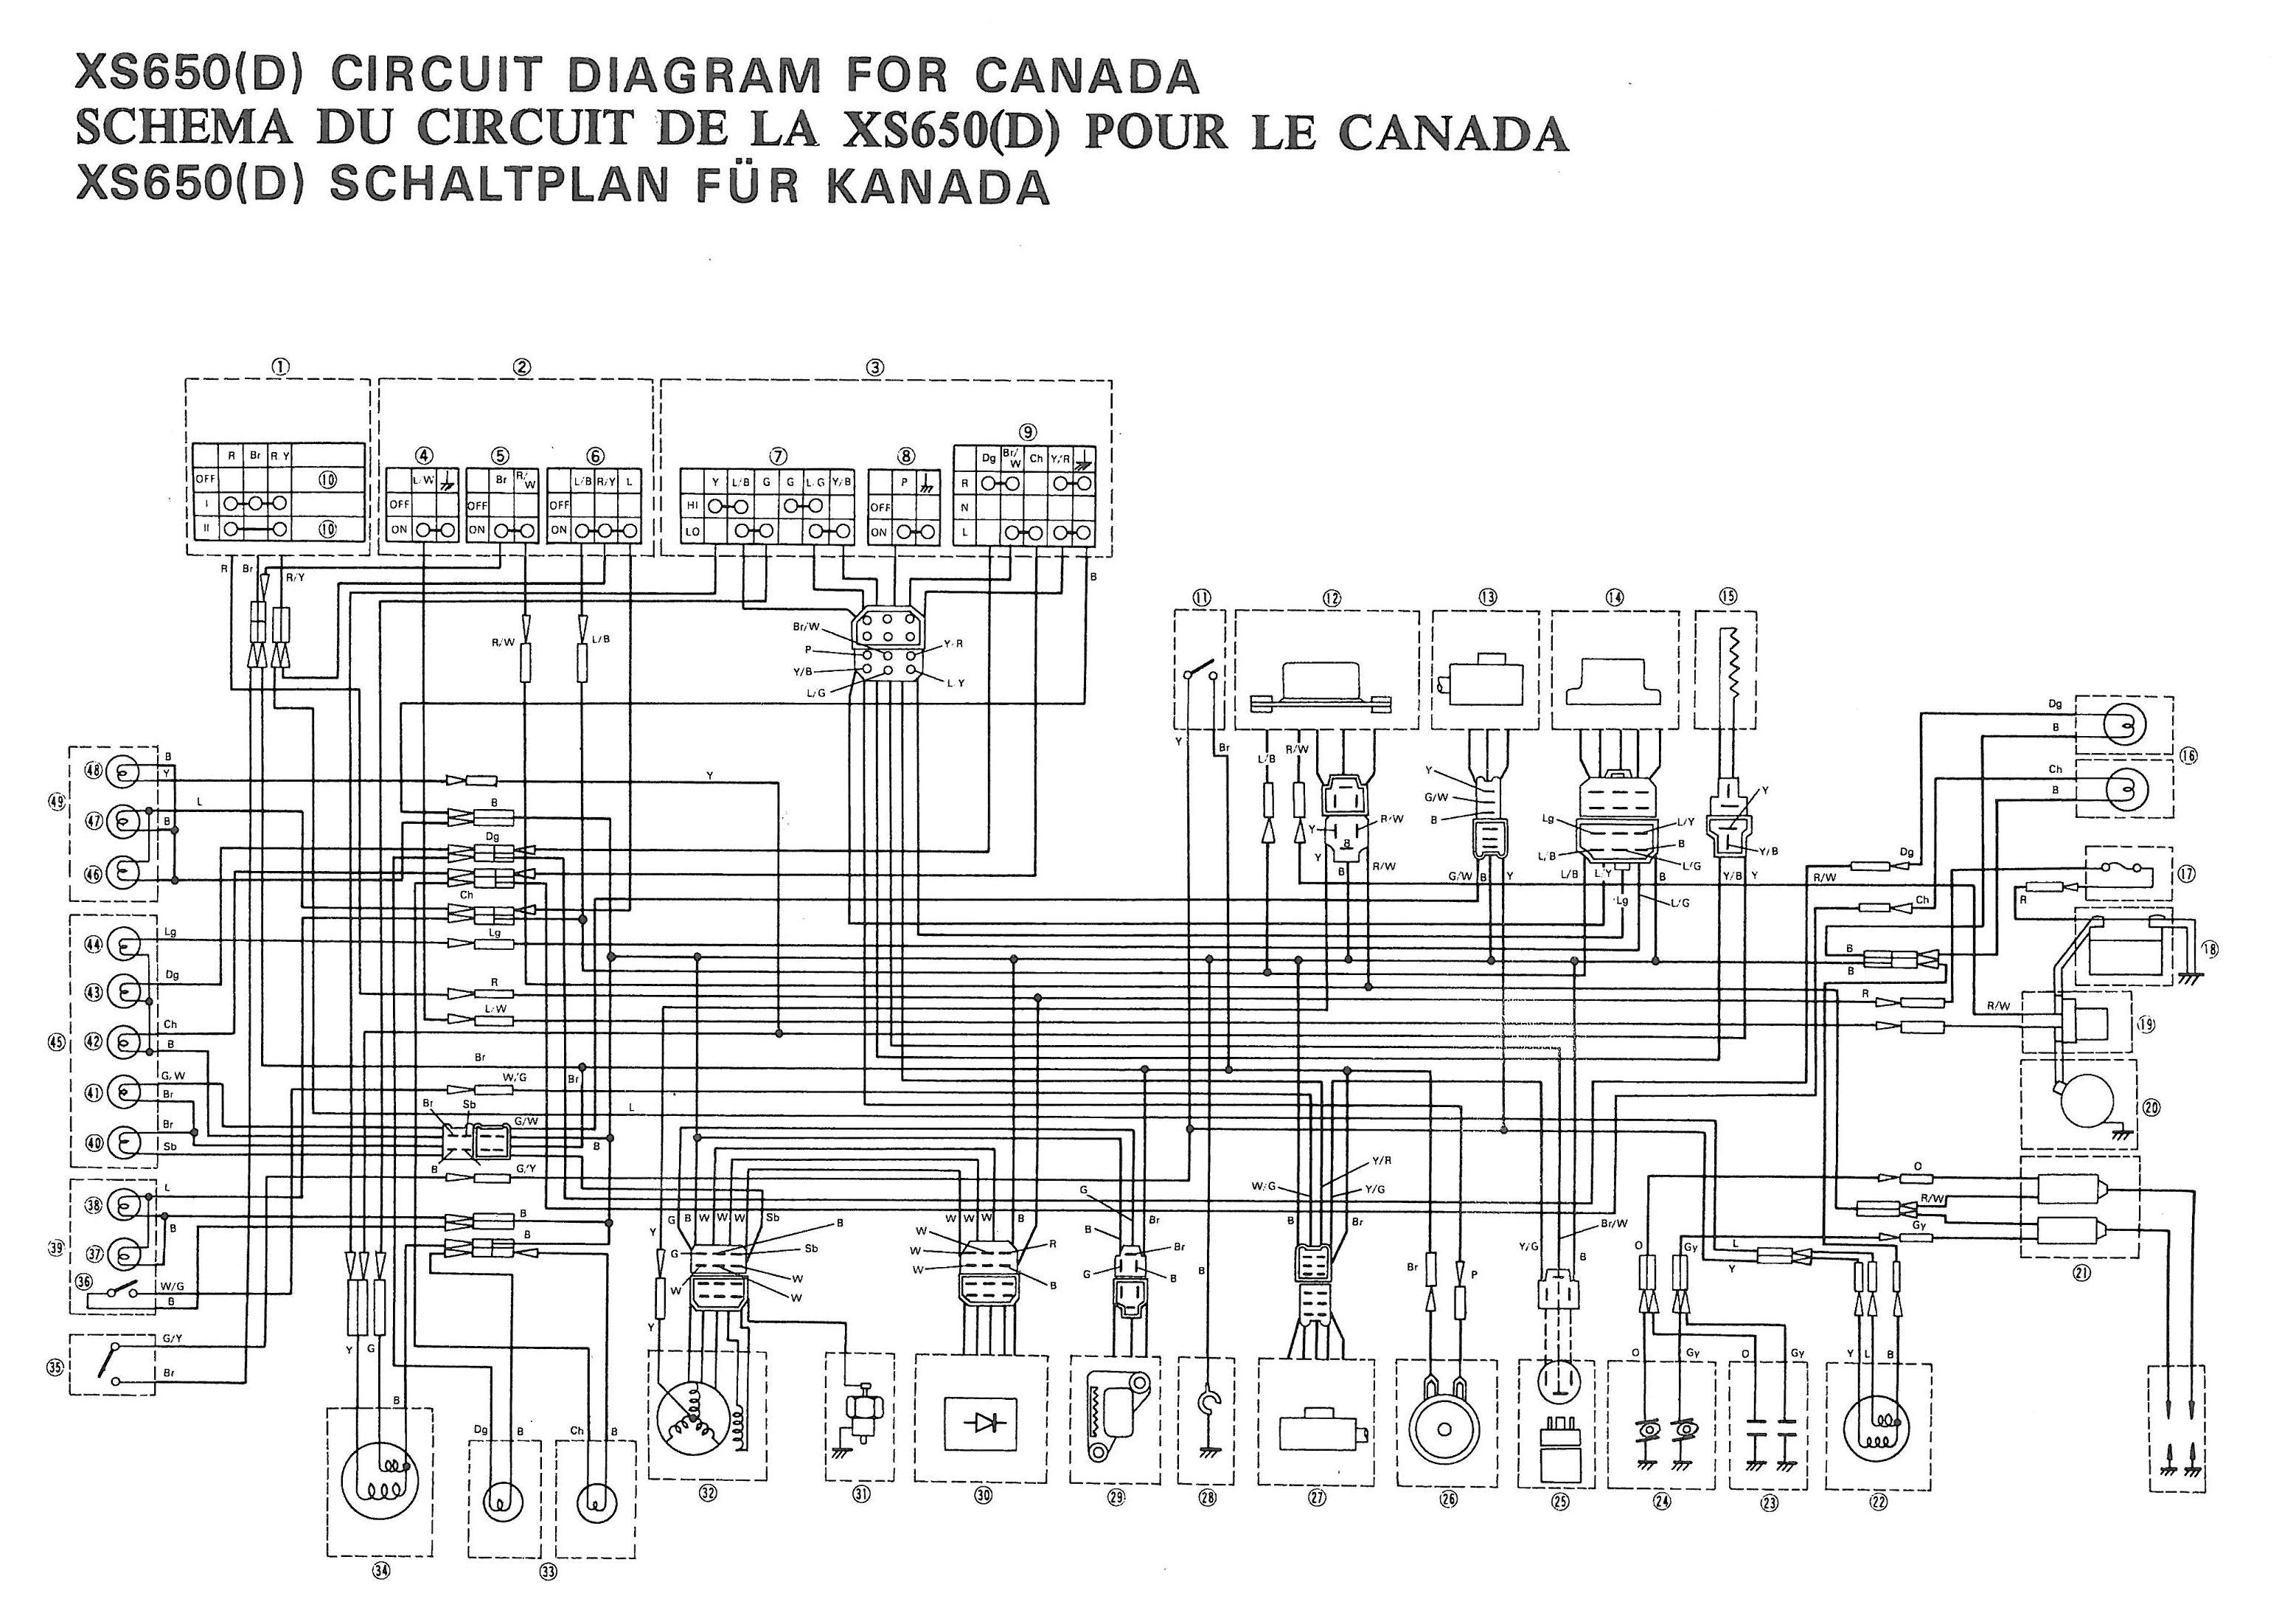 1979 yamaha xs750 special wiring diagram hobbiesxstyle 1981 xs650 wiring diagram 1978 yamaha xs650 wiring diagram [ 3114 x 2187 Pixel ]